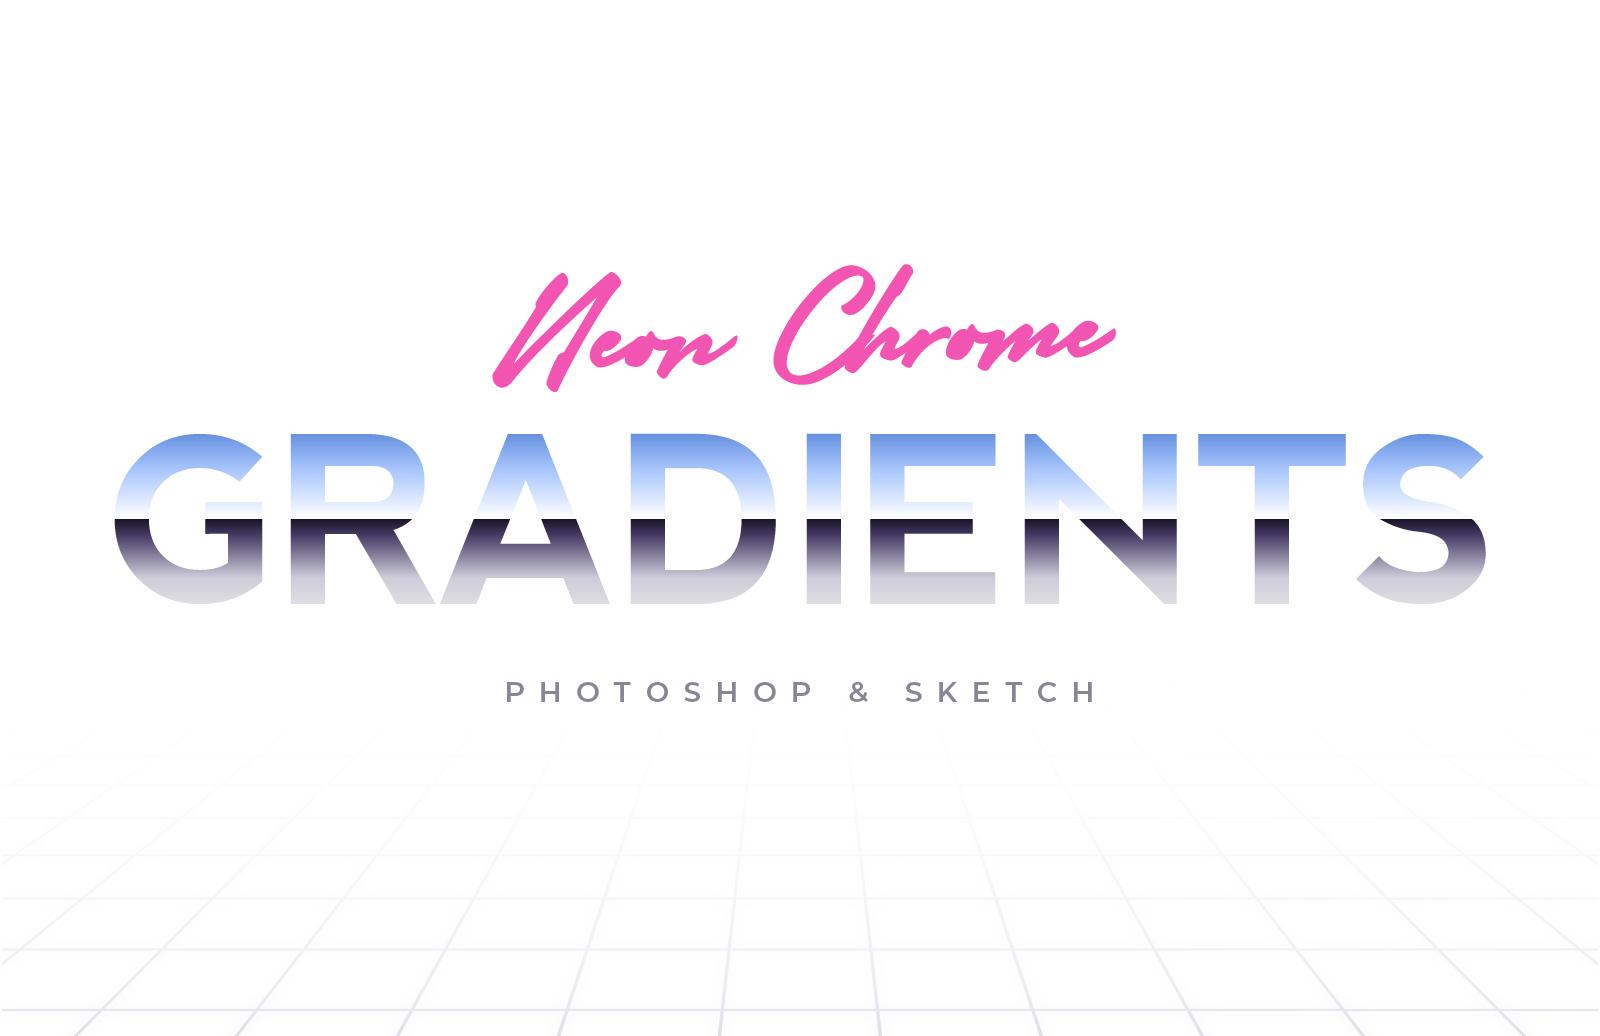 80S Neon Chrome Gradients Preview 1